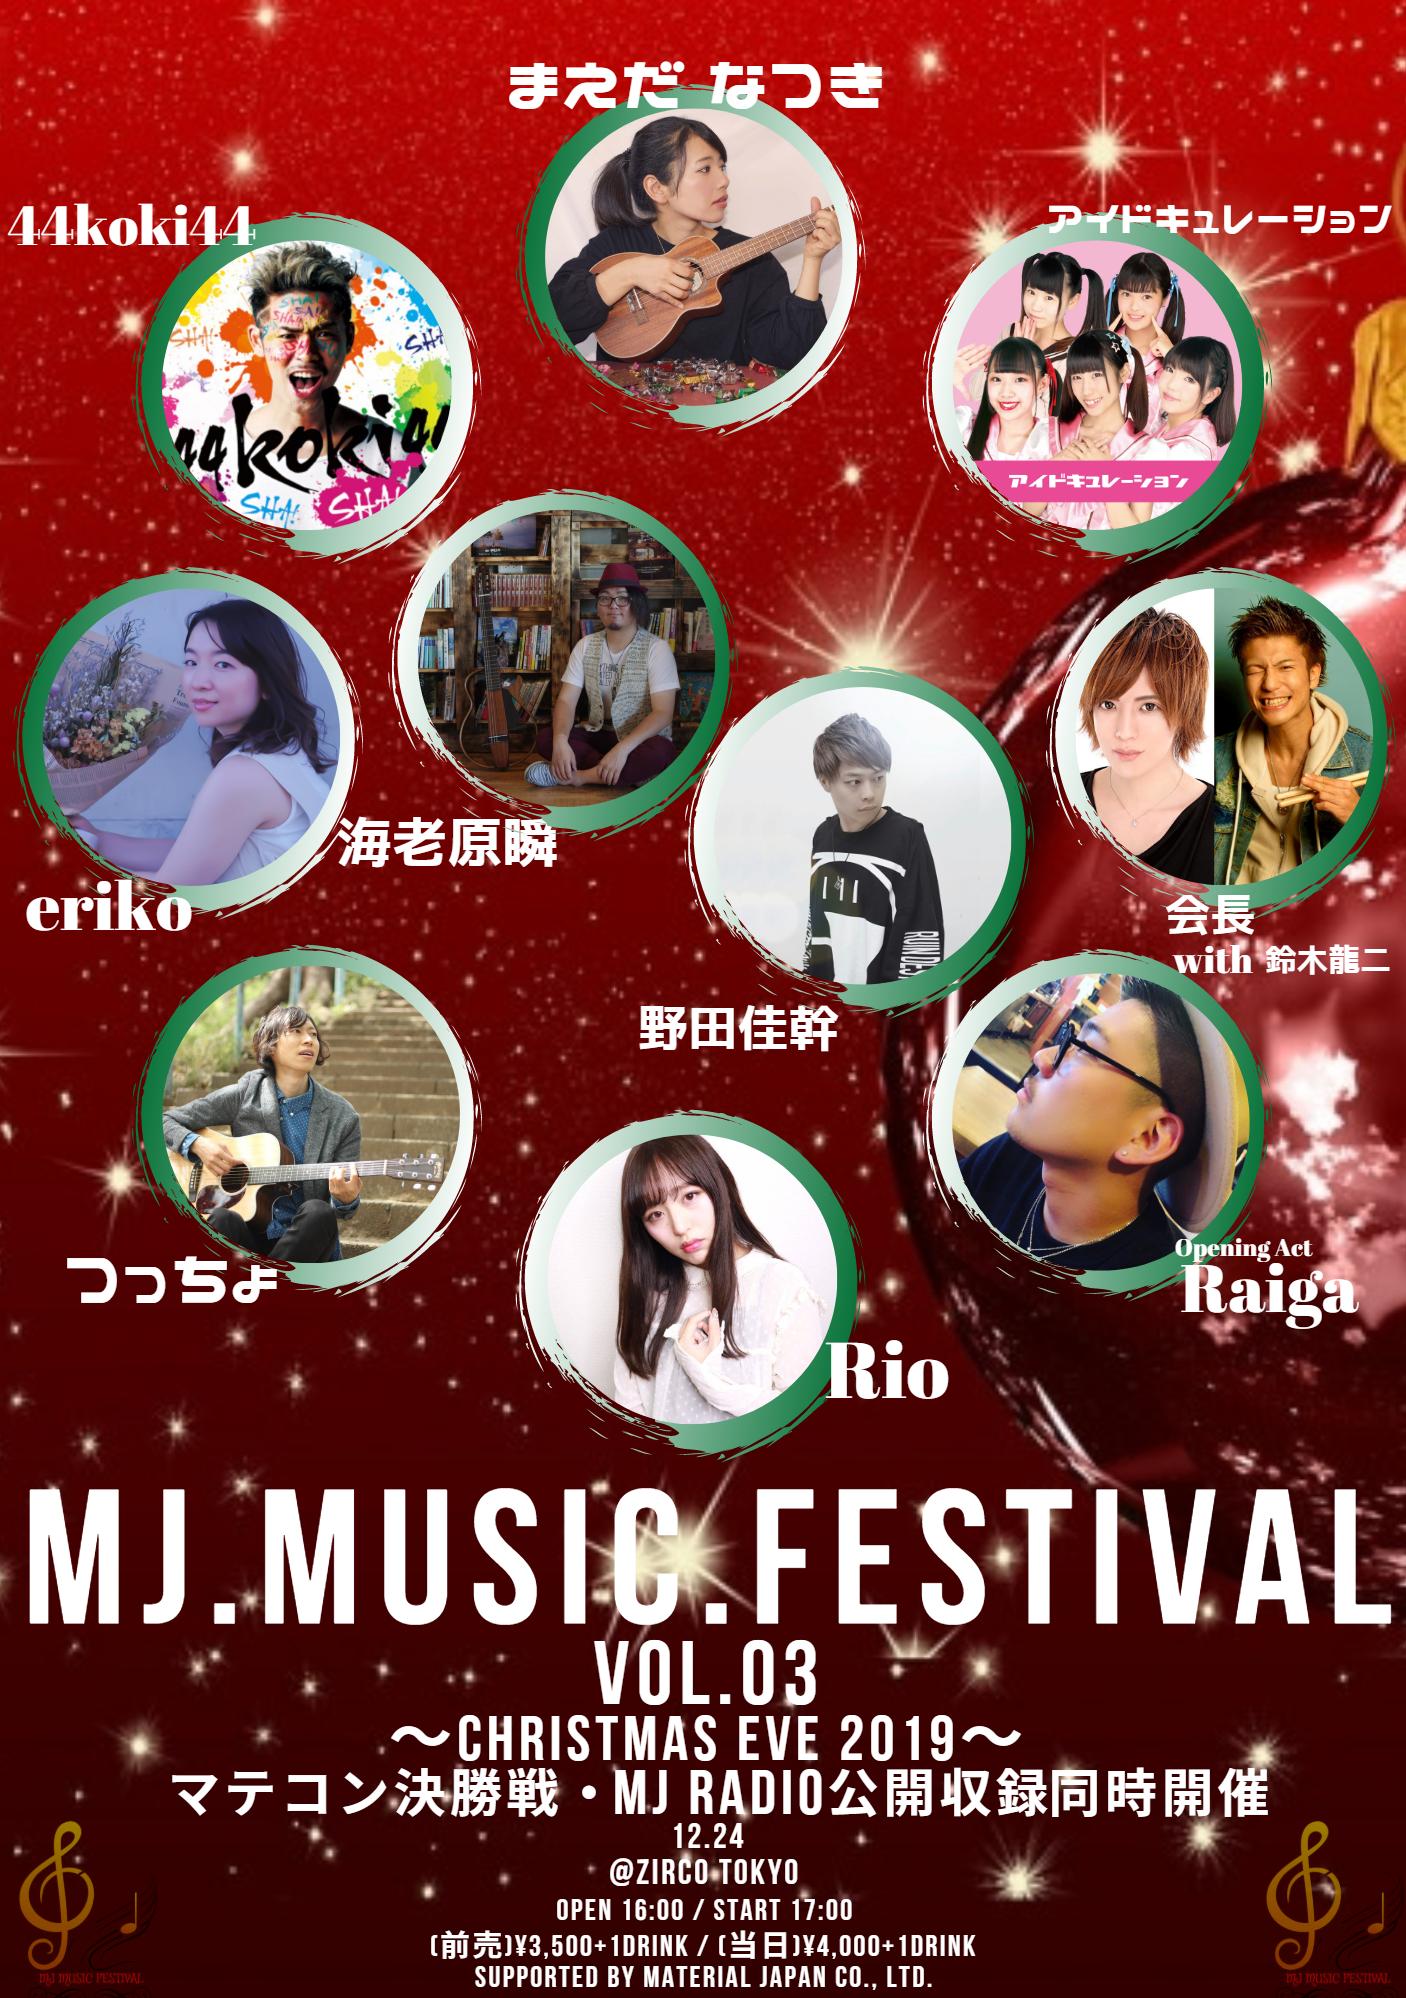 MJ.MUSIC.FESTIVAL Vol.03 ~CHRISTMAS EVE 2019~